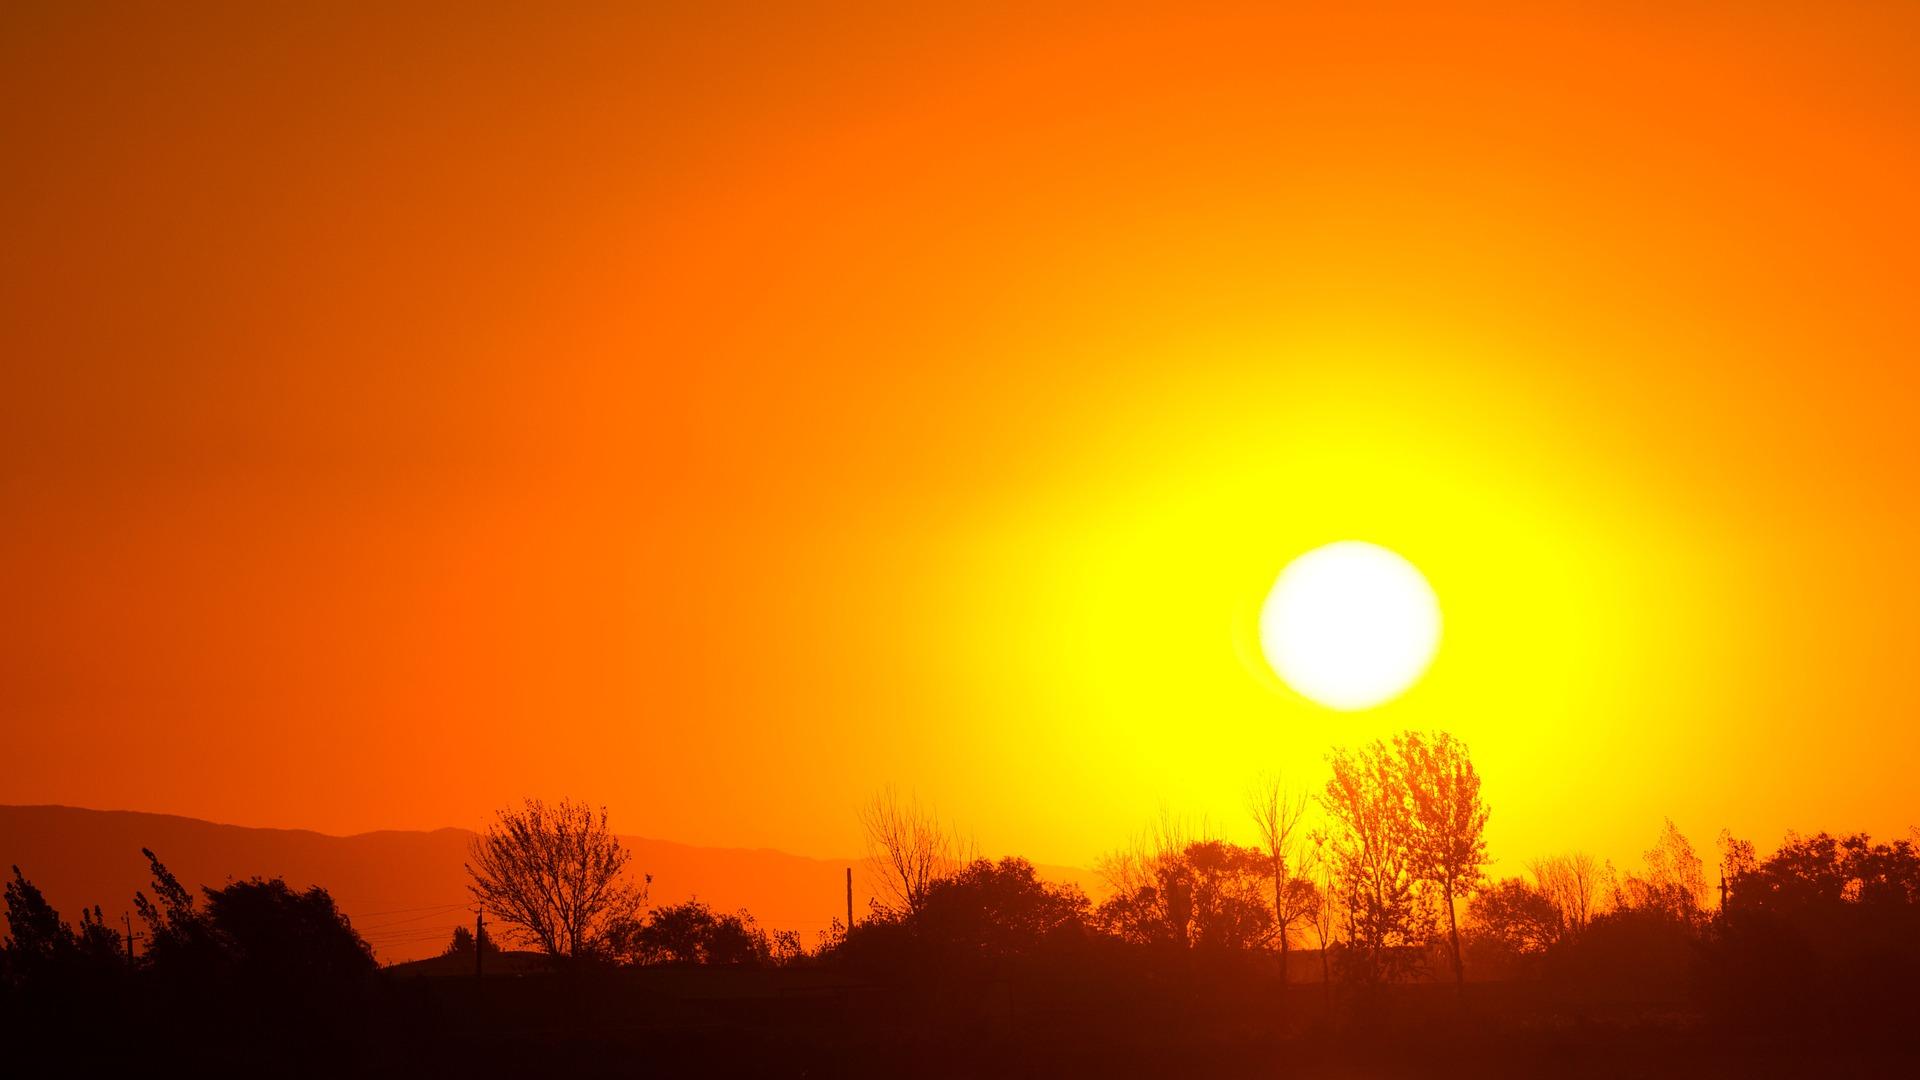 sunset-1404129_1920.jpg